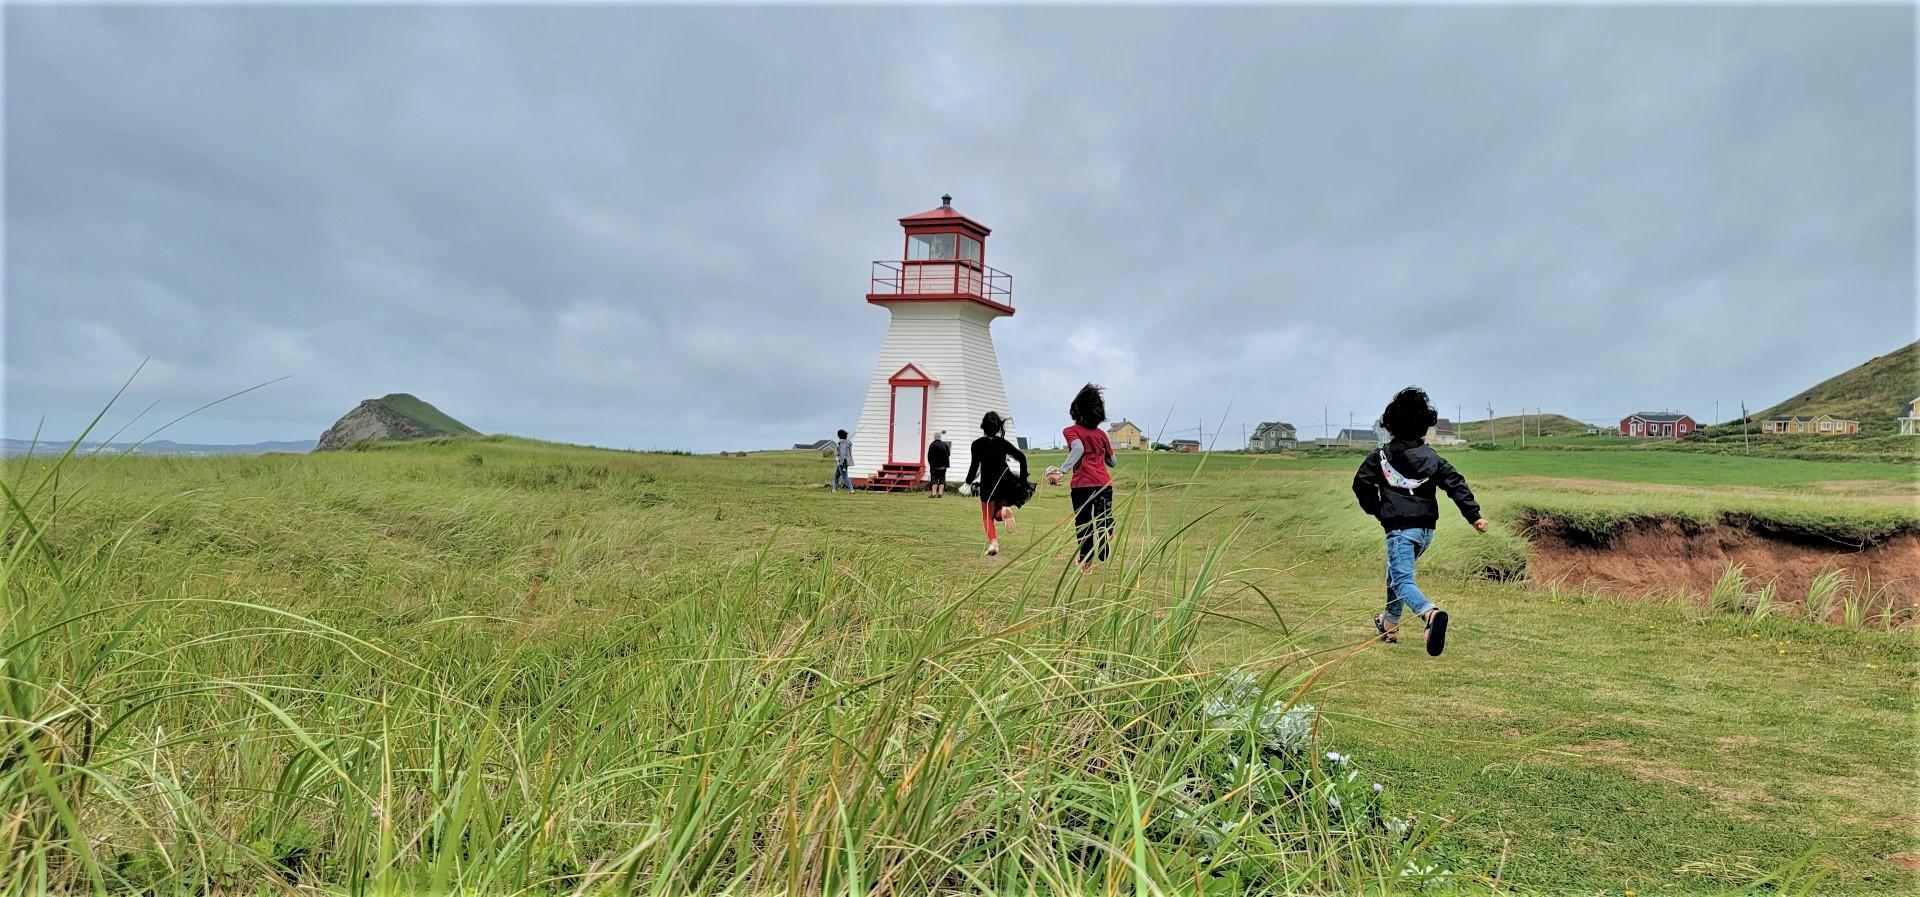 Kids running towards lighhouse on Magdalen Islands